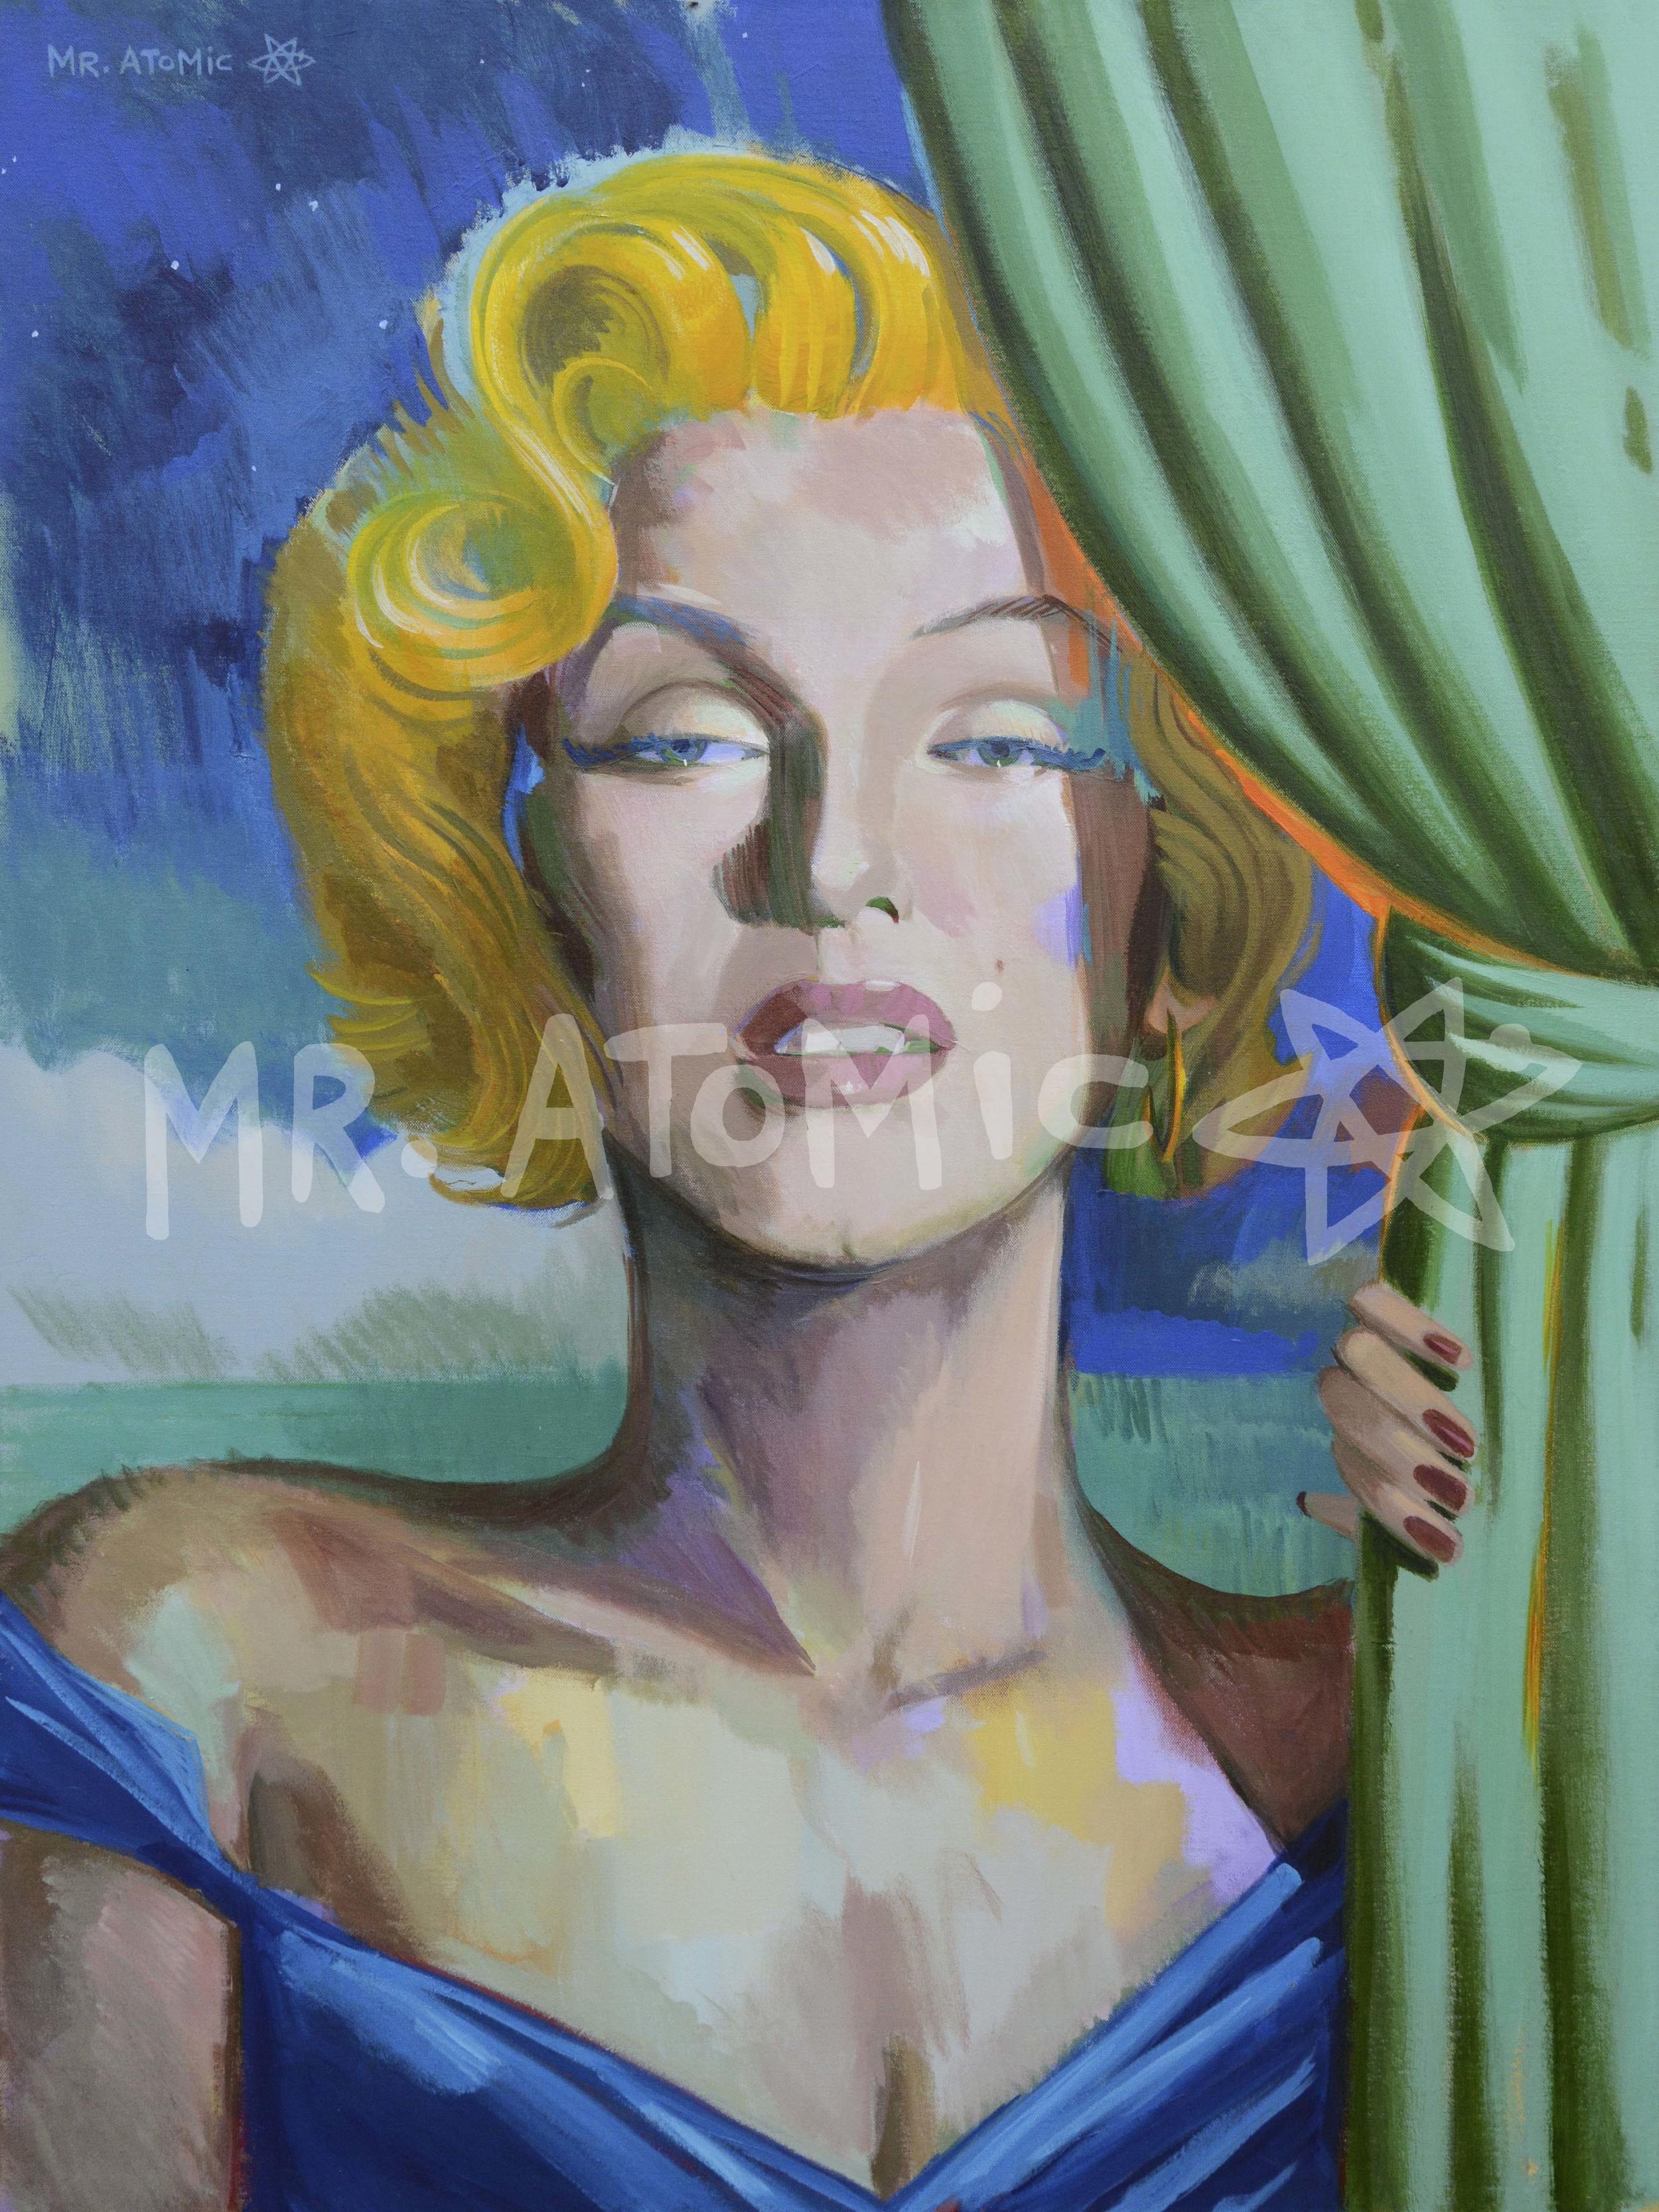 Pillow Case Blonde (Marilyn Monroe) - 3'x4'